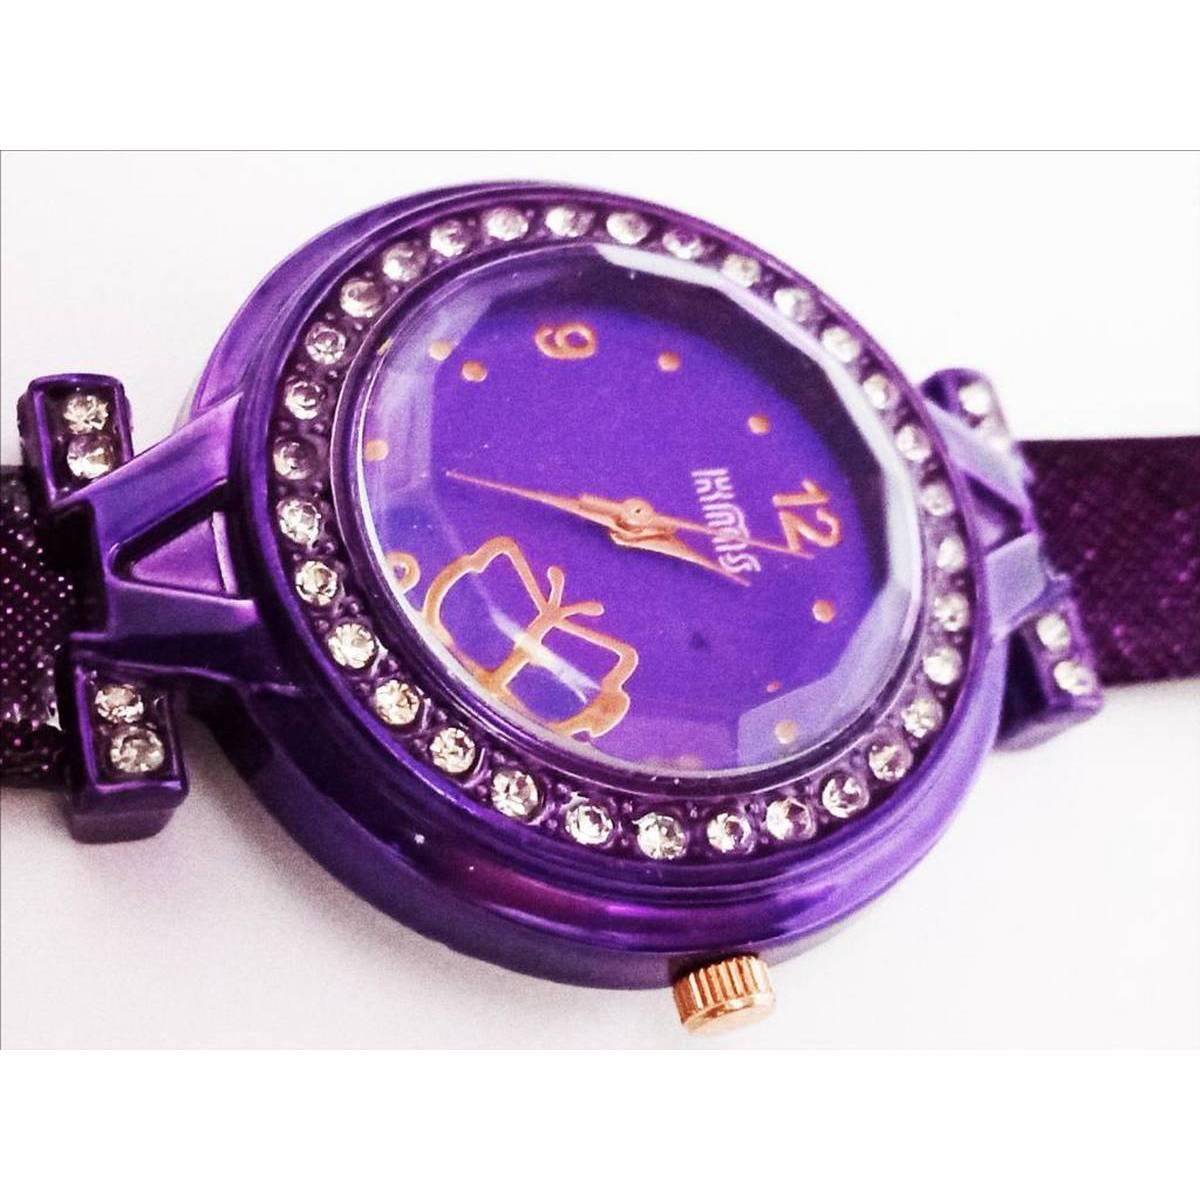 watch for Women and Girls Purple Round Diamond Style